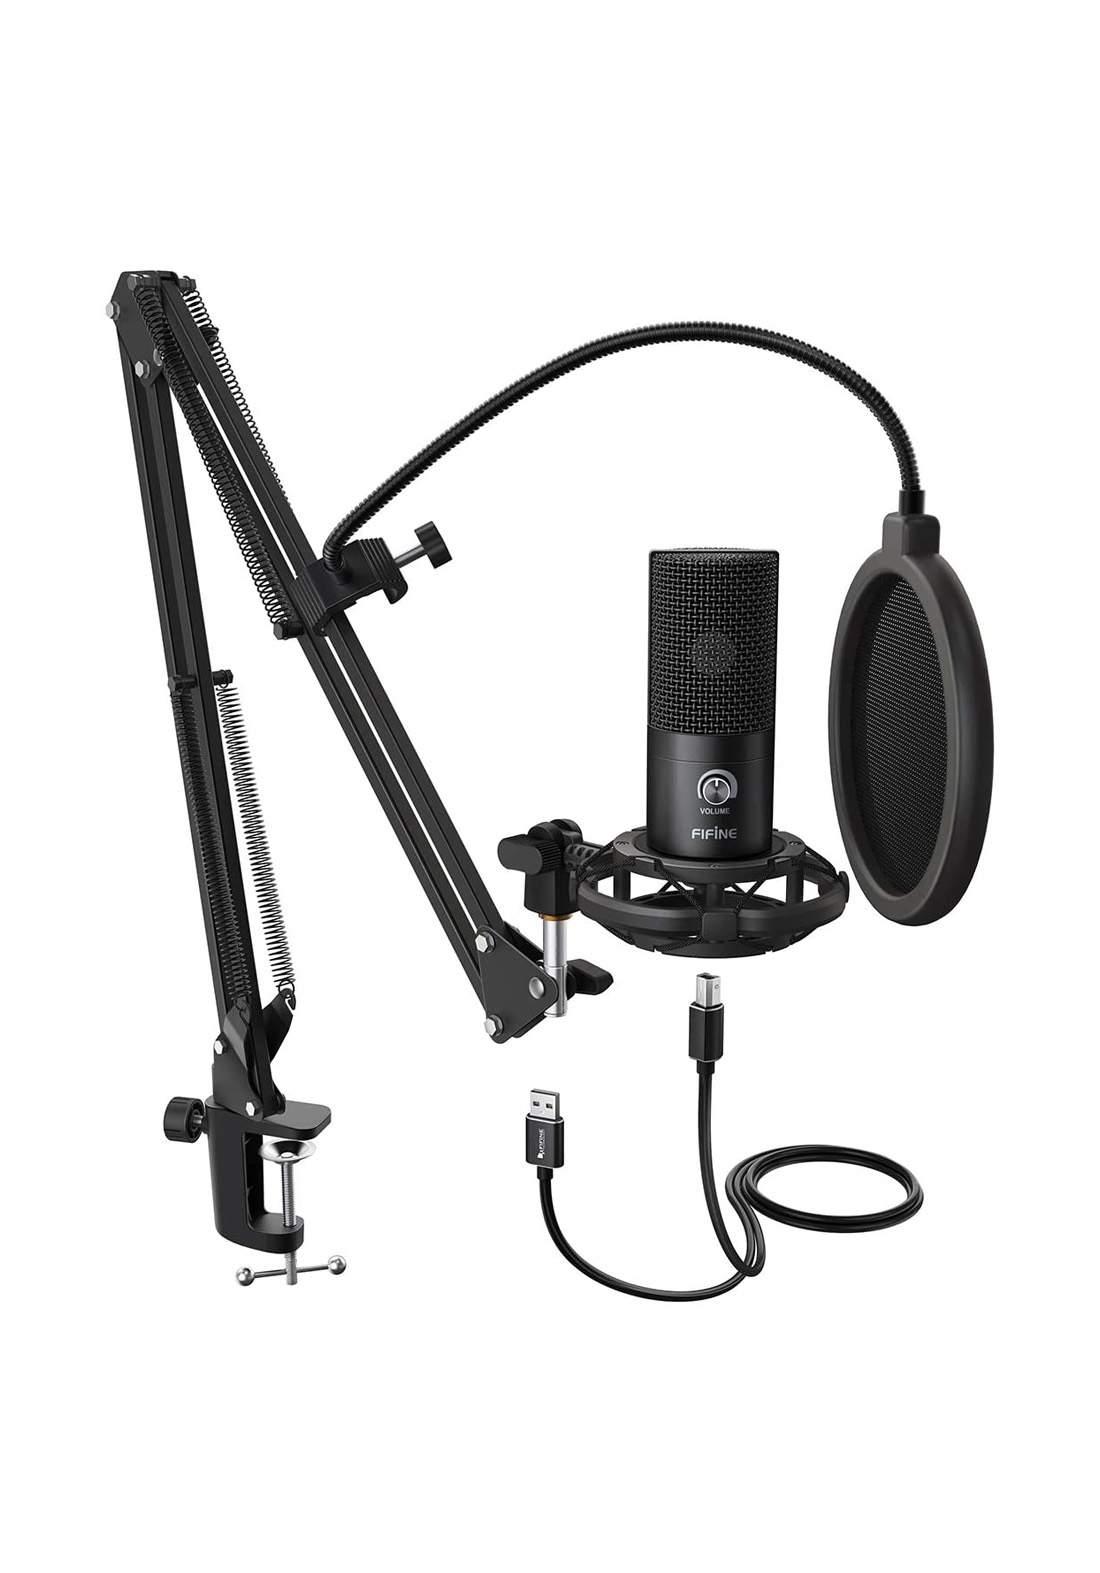 Fifine T669 Condenser Microphone - Black  مايكروفون